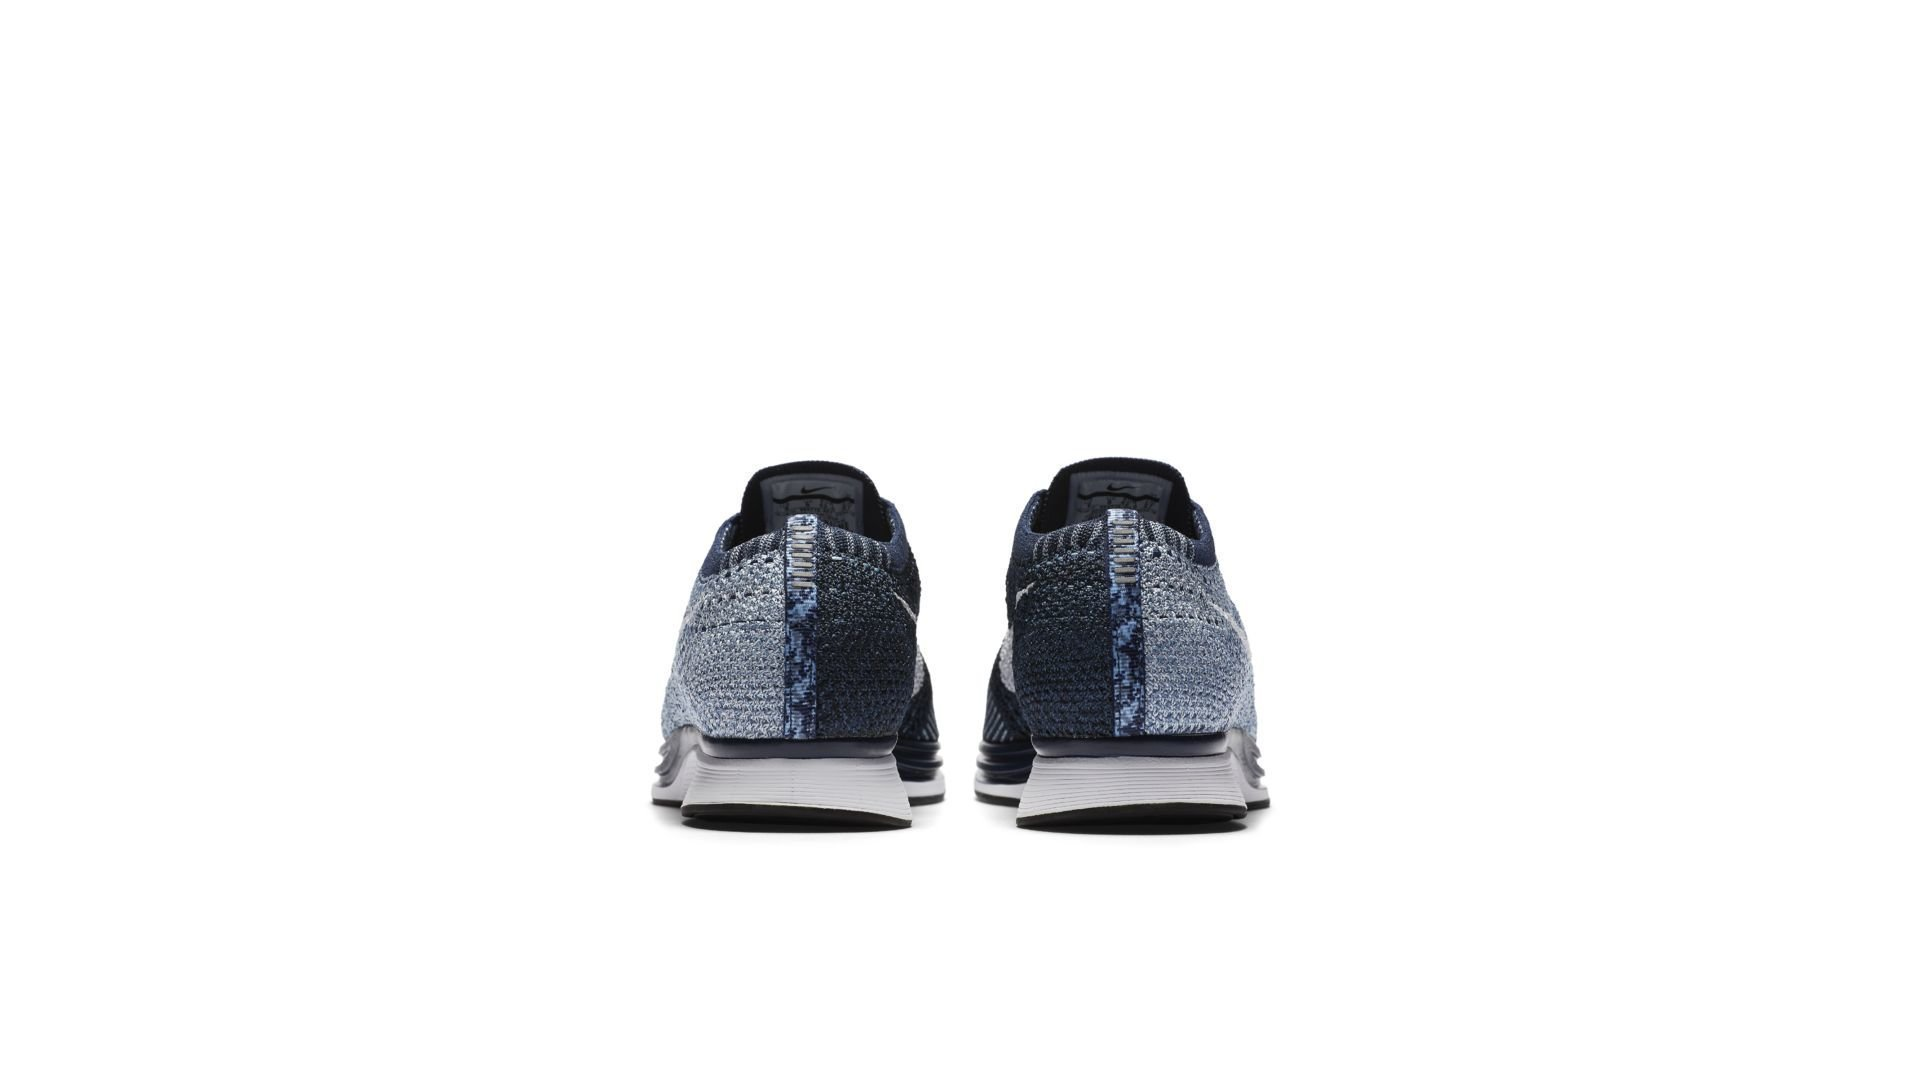 Nike Flyknit Racer Blue Tint (862713-401)